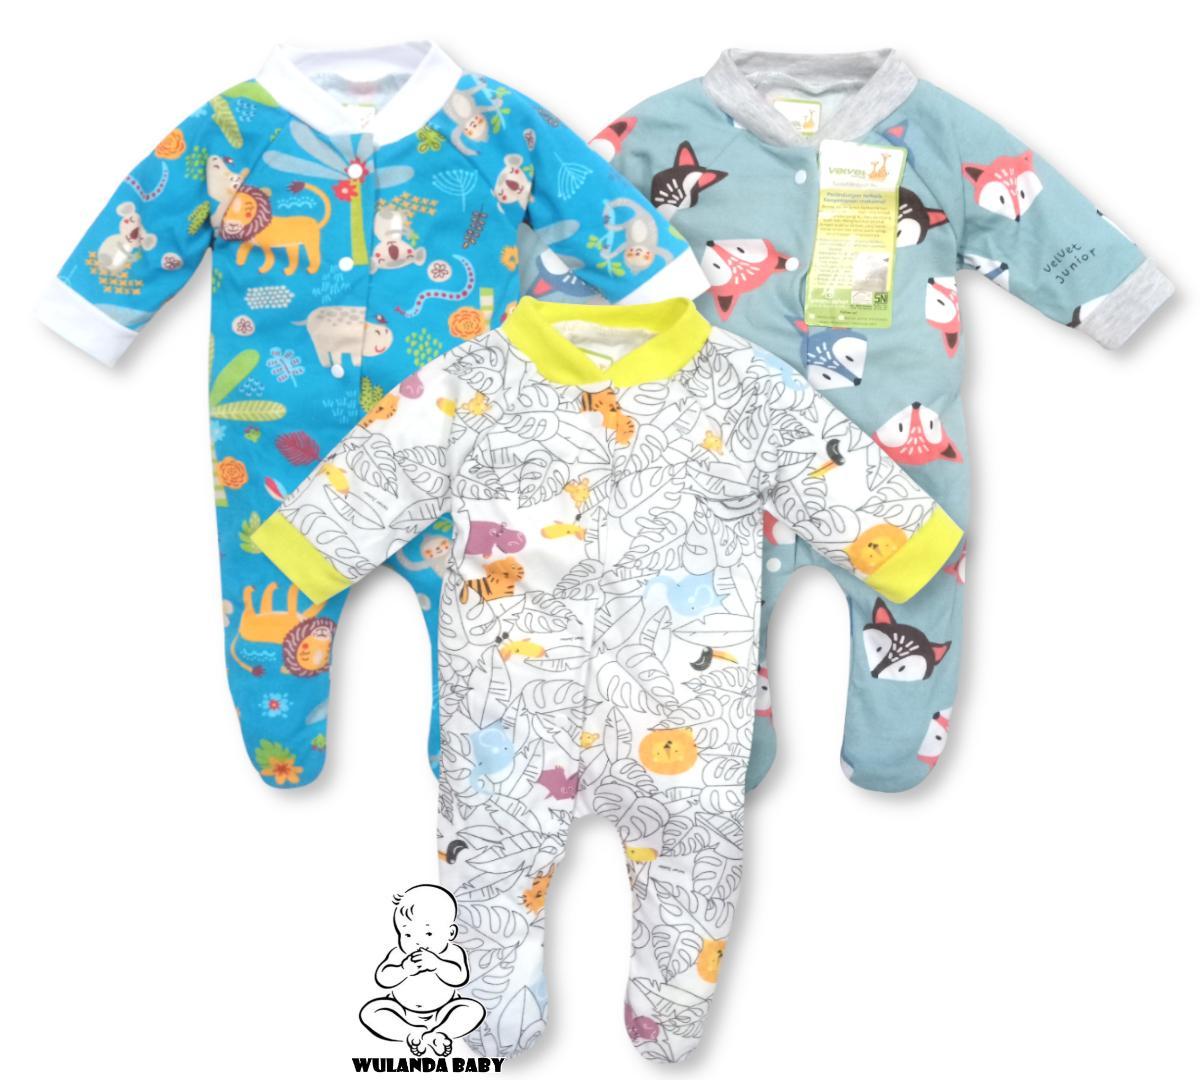 Wulanda 3 Pcs Baju Kodok Slipsweet Rompers Overall Anak Bayi Velvet Tutup Kaki By Wulanda Baby.